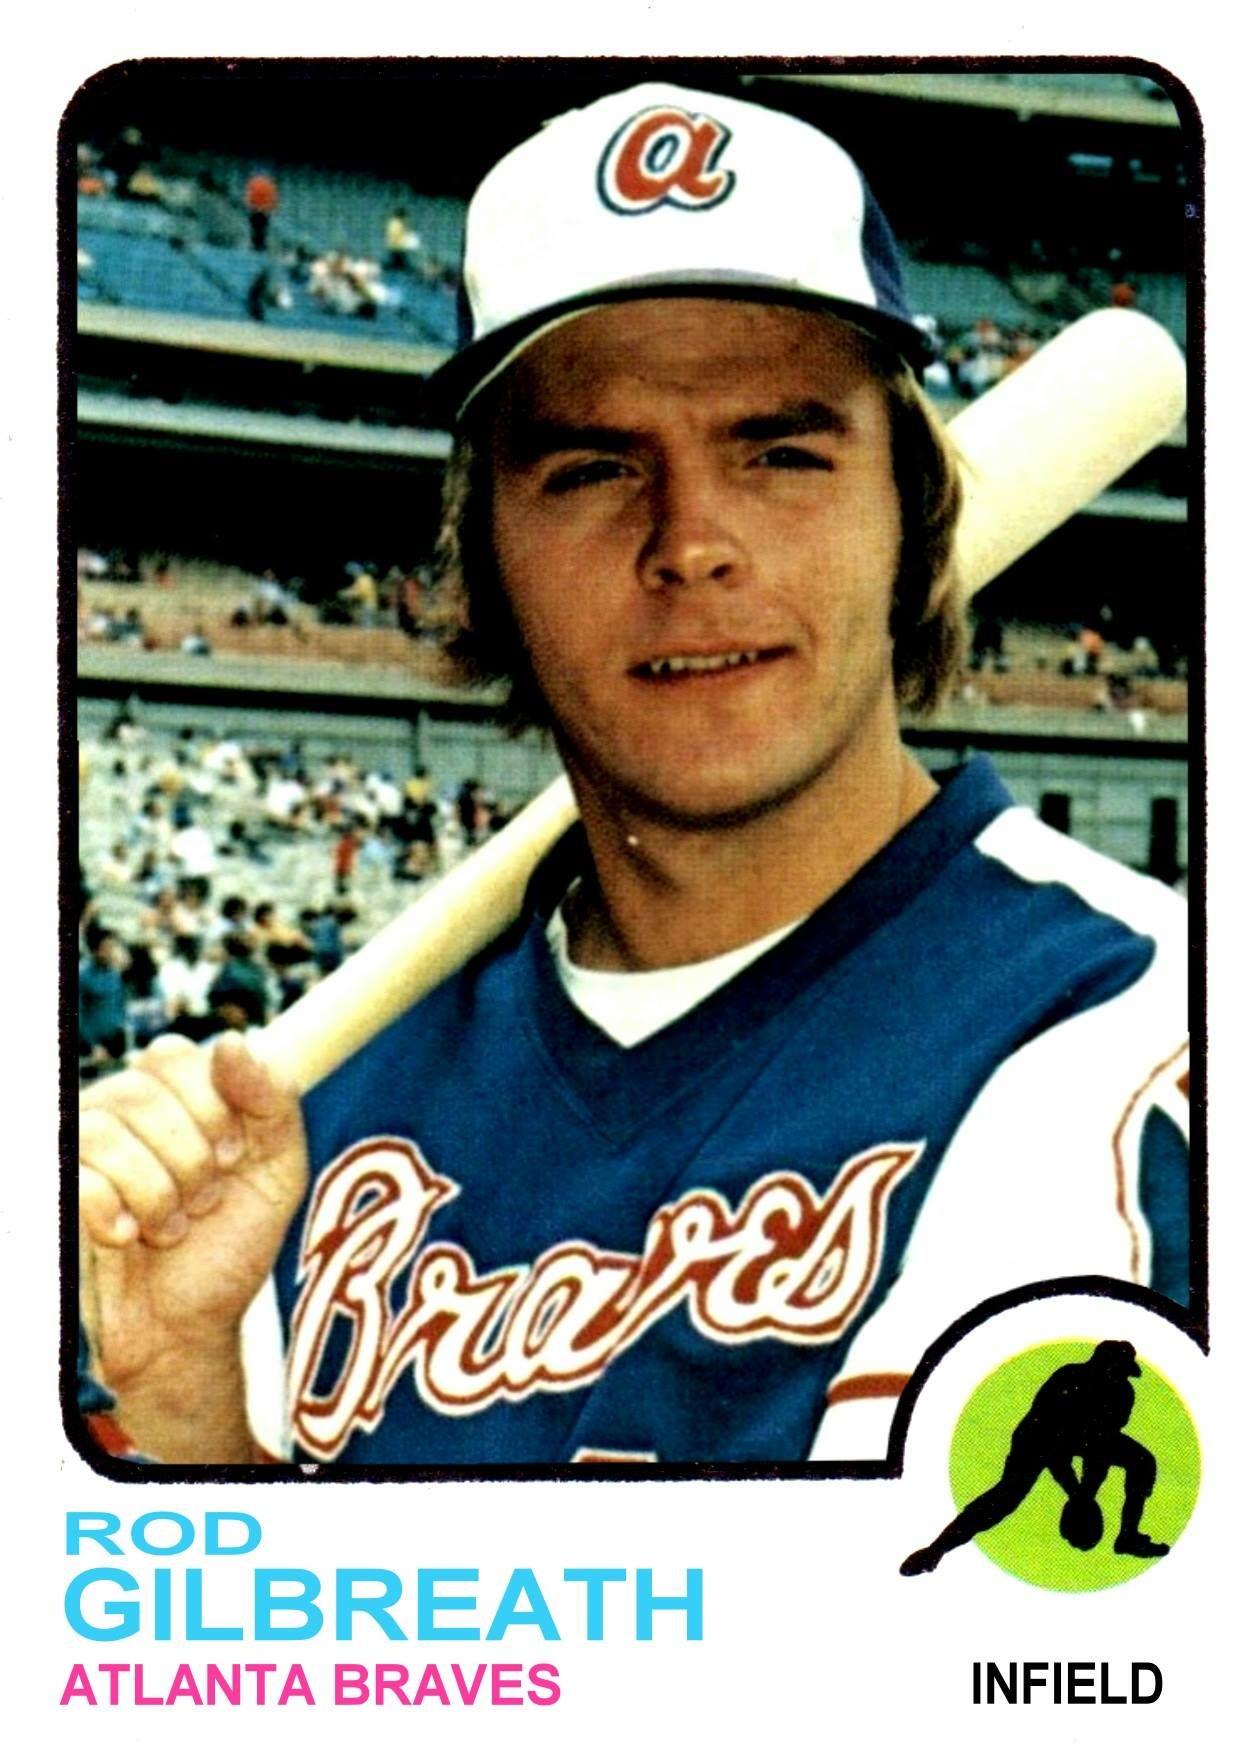 Pin By Robert Lumpkin On 1970 1979 Atlanta Braves Other People S Customs Creations Atlanta Braves Braves Atlanta